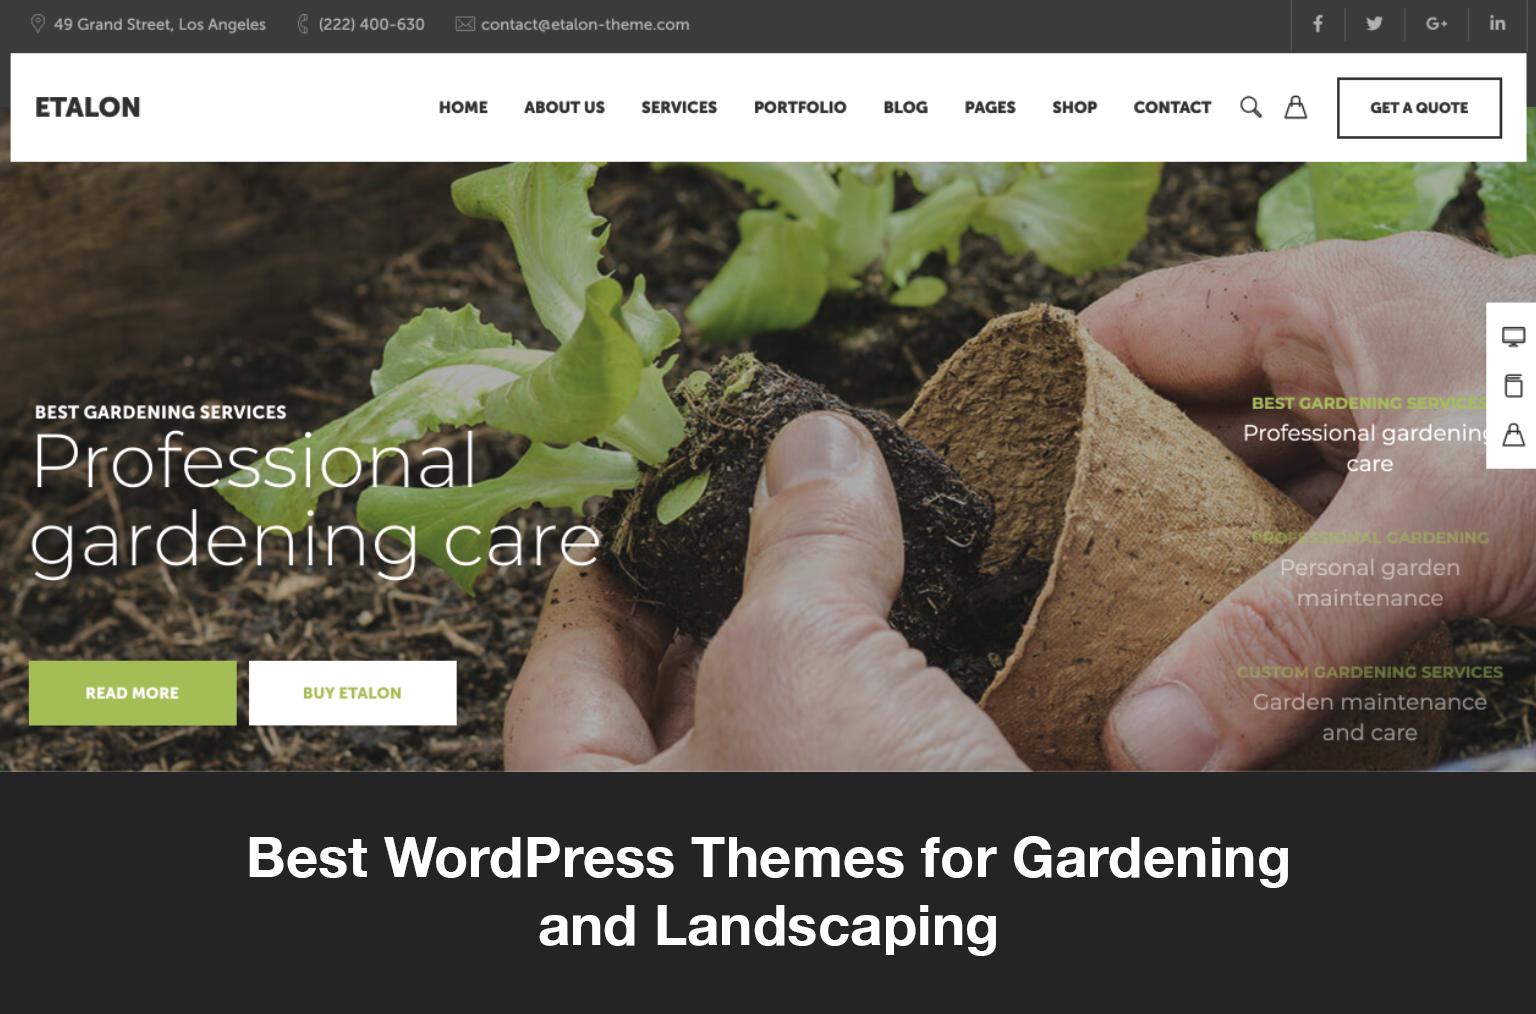 Best WordPress Themes for Gardening & Landscaping